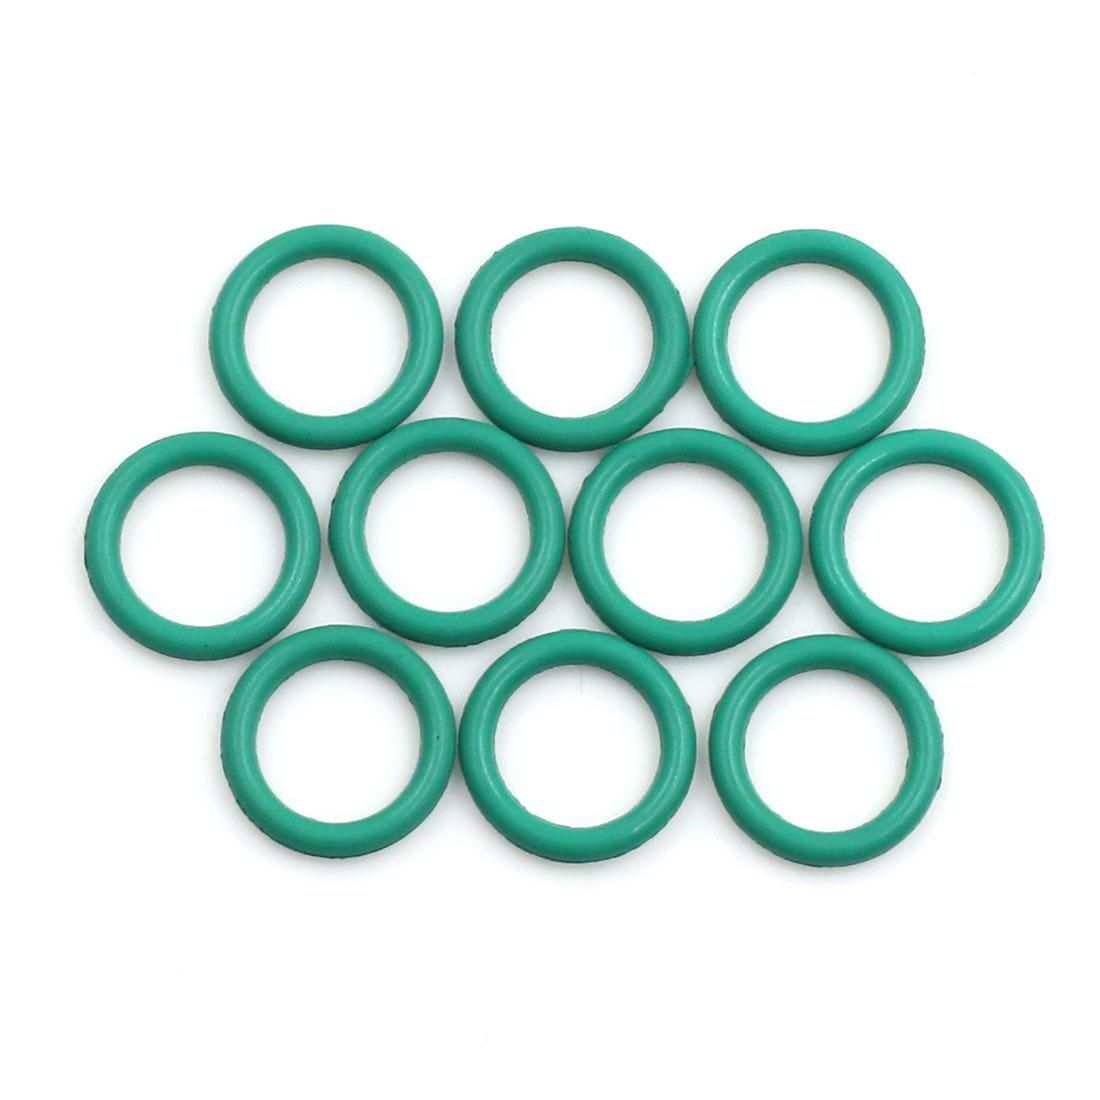 10pcs Green Universal FKM O-Ring Sealing Gasket Washer for Car 13mm x 2mm